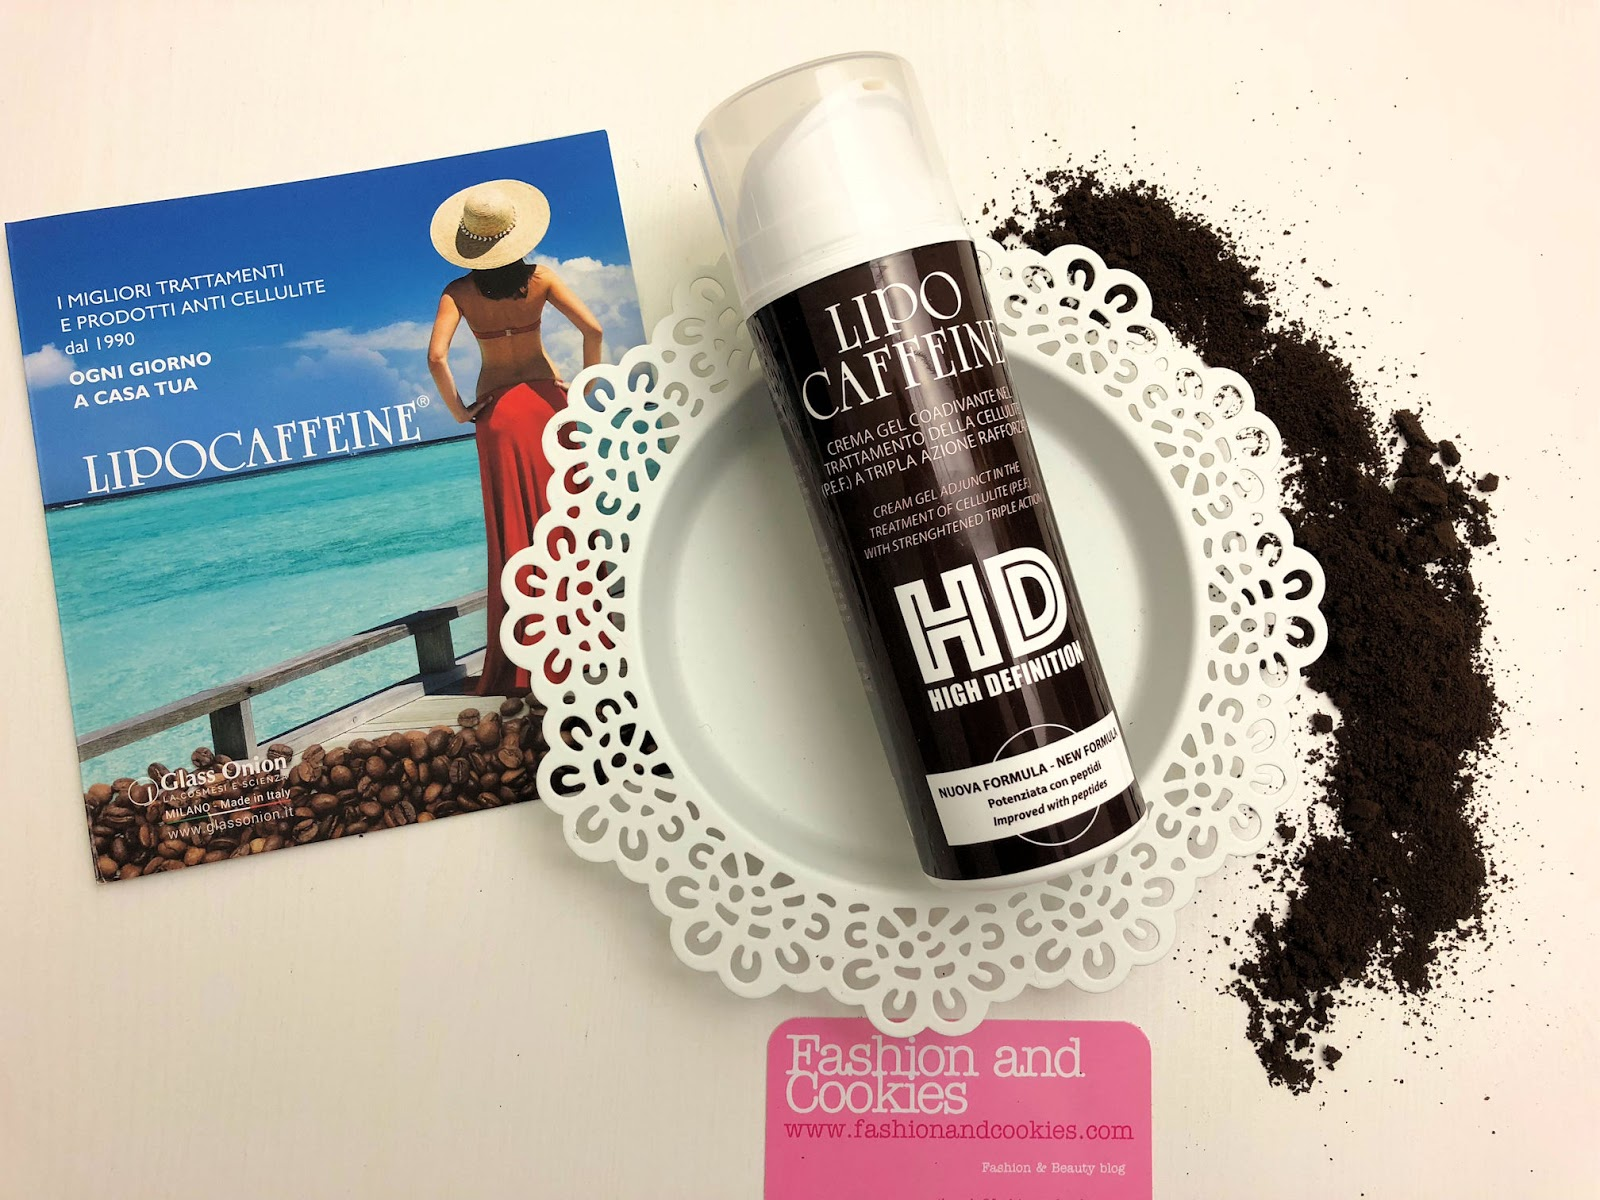 S.O.S. Cellulite: Glass Onion Lipocaffeine HD crema gel anticellulite su Fashion and Cookies beauty blog, beauty blogger